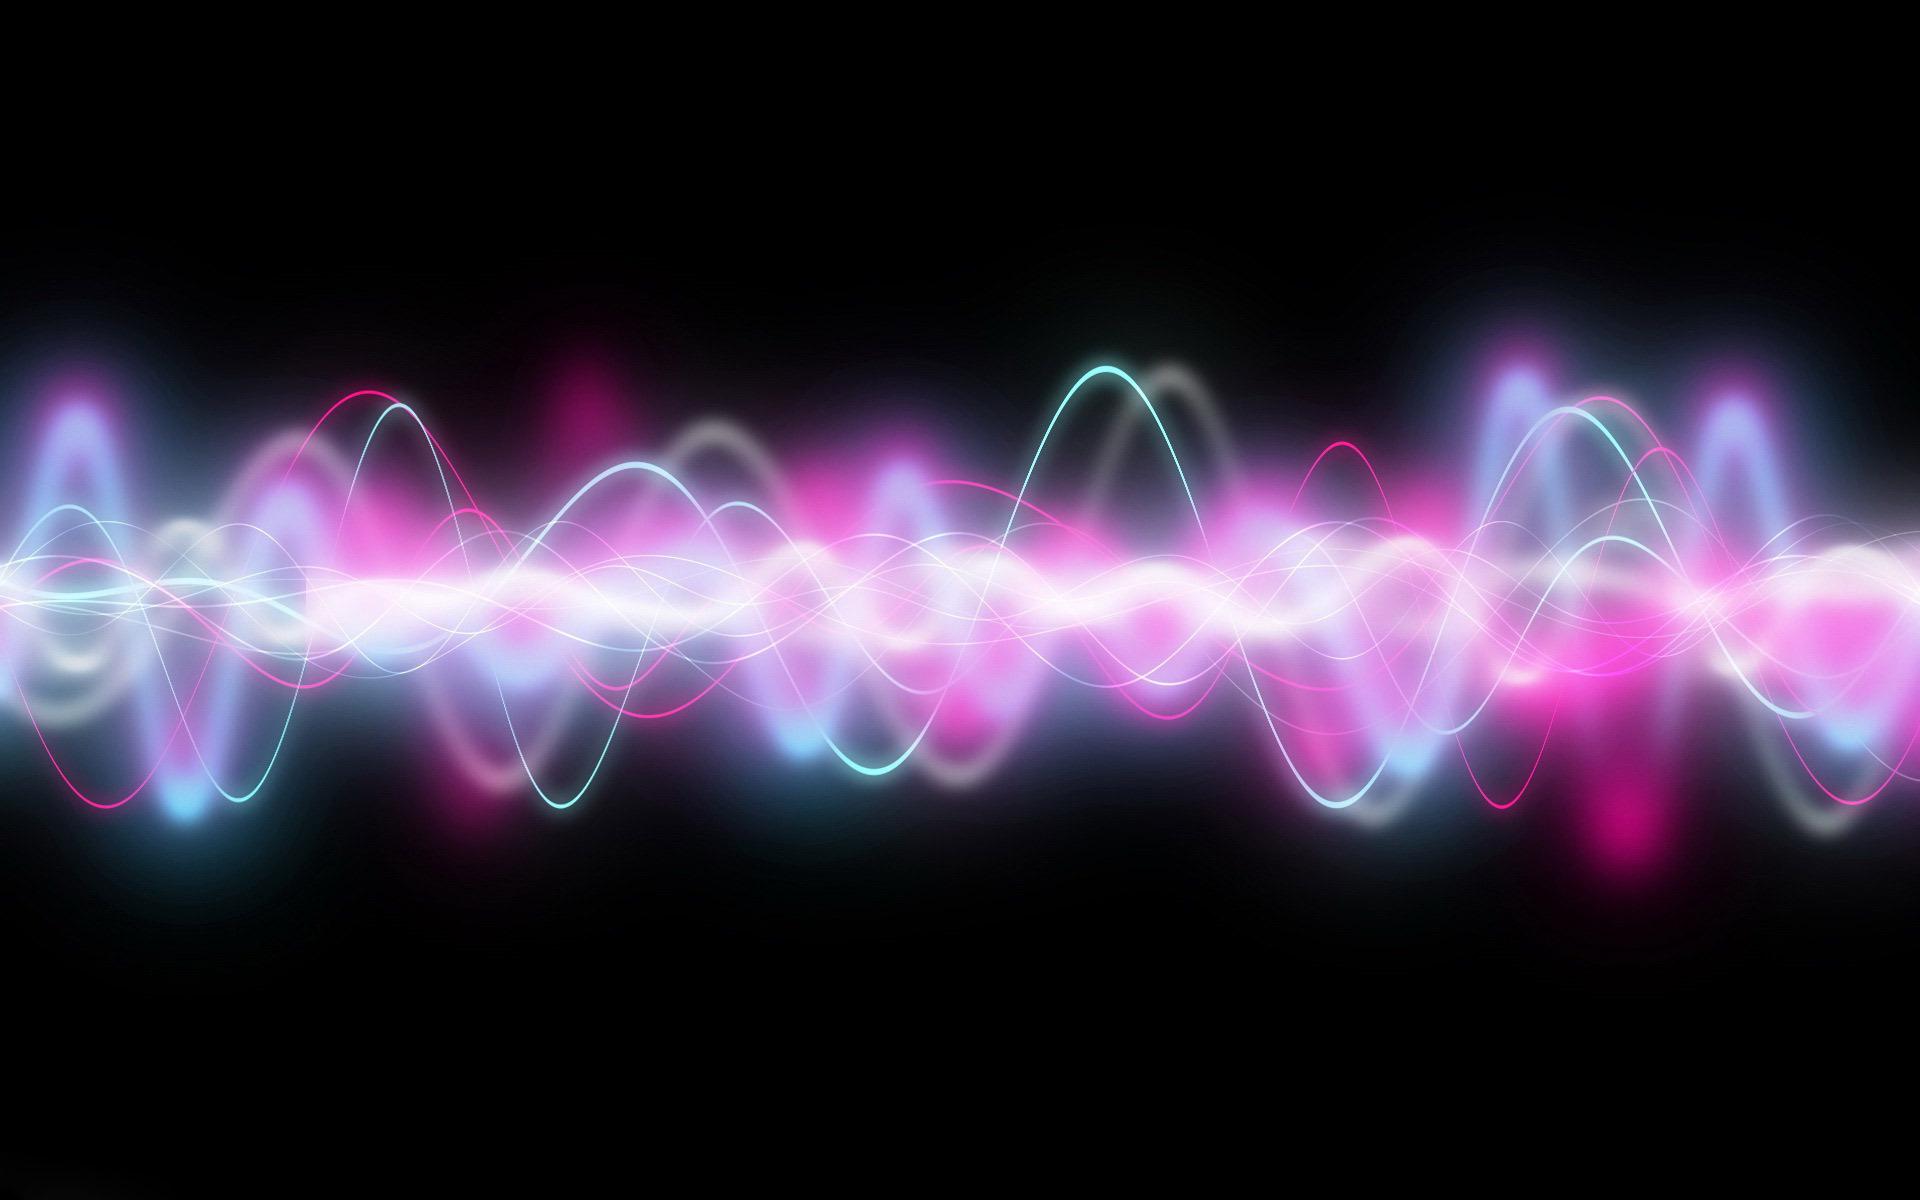 Sound waves wallpaper 174 1920x1200